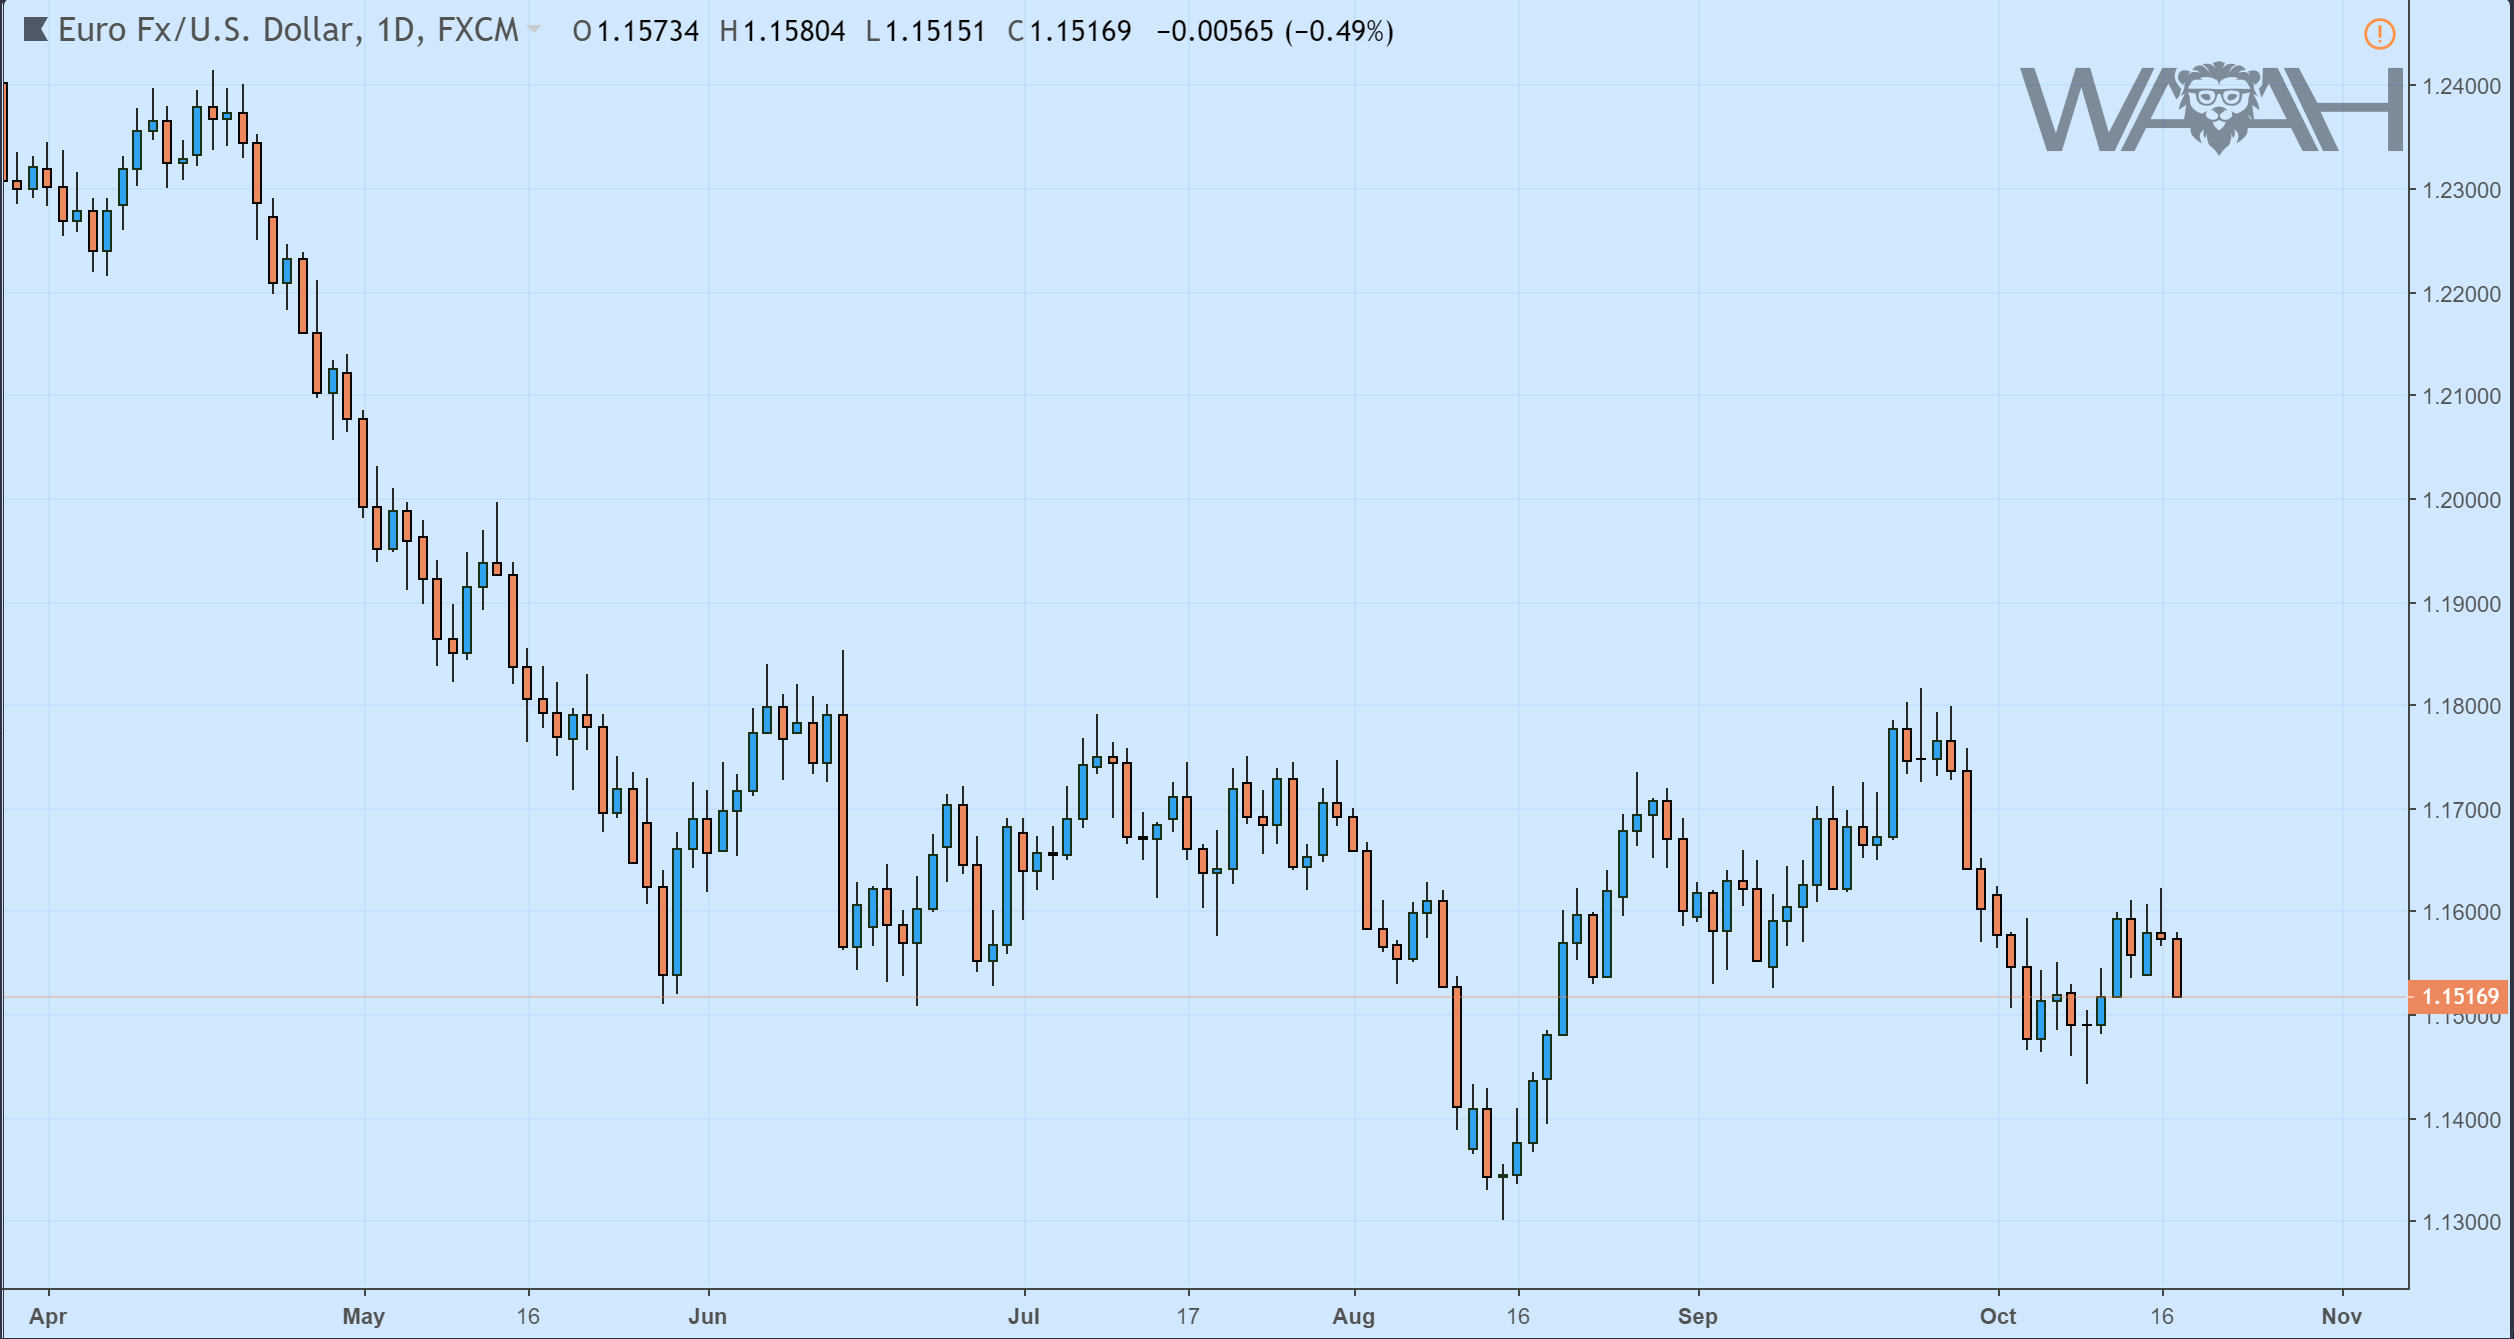 EUR/USD daglig graf – Candlestick Chart